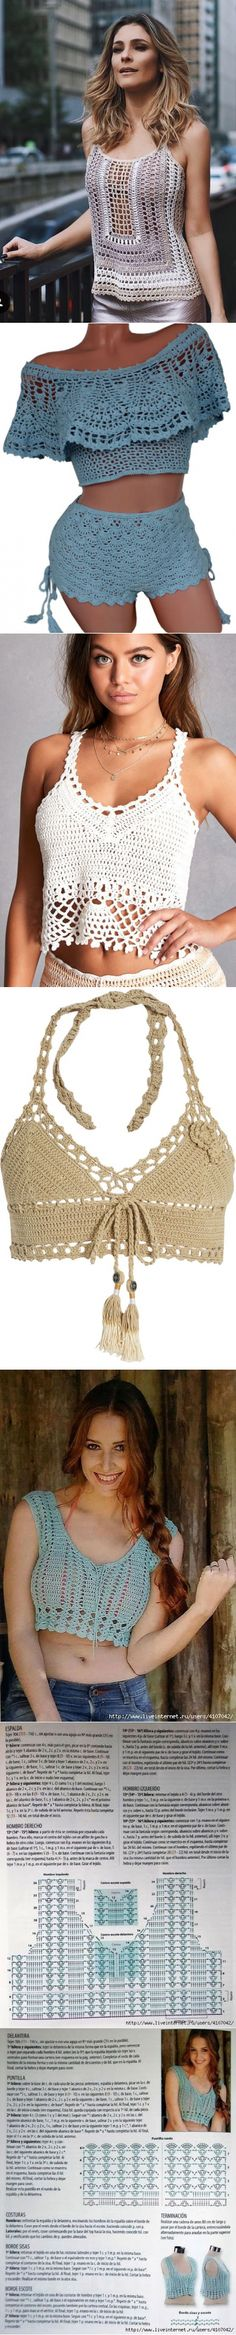 Crochetemoda Blog: Crochet Tops.Идеи. // Taika